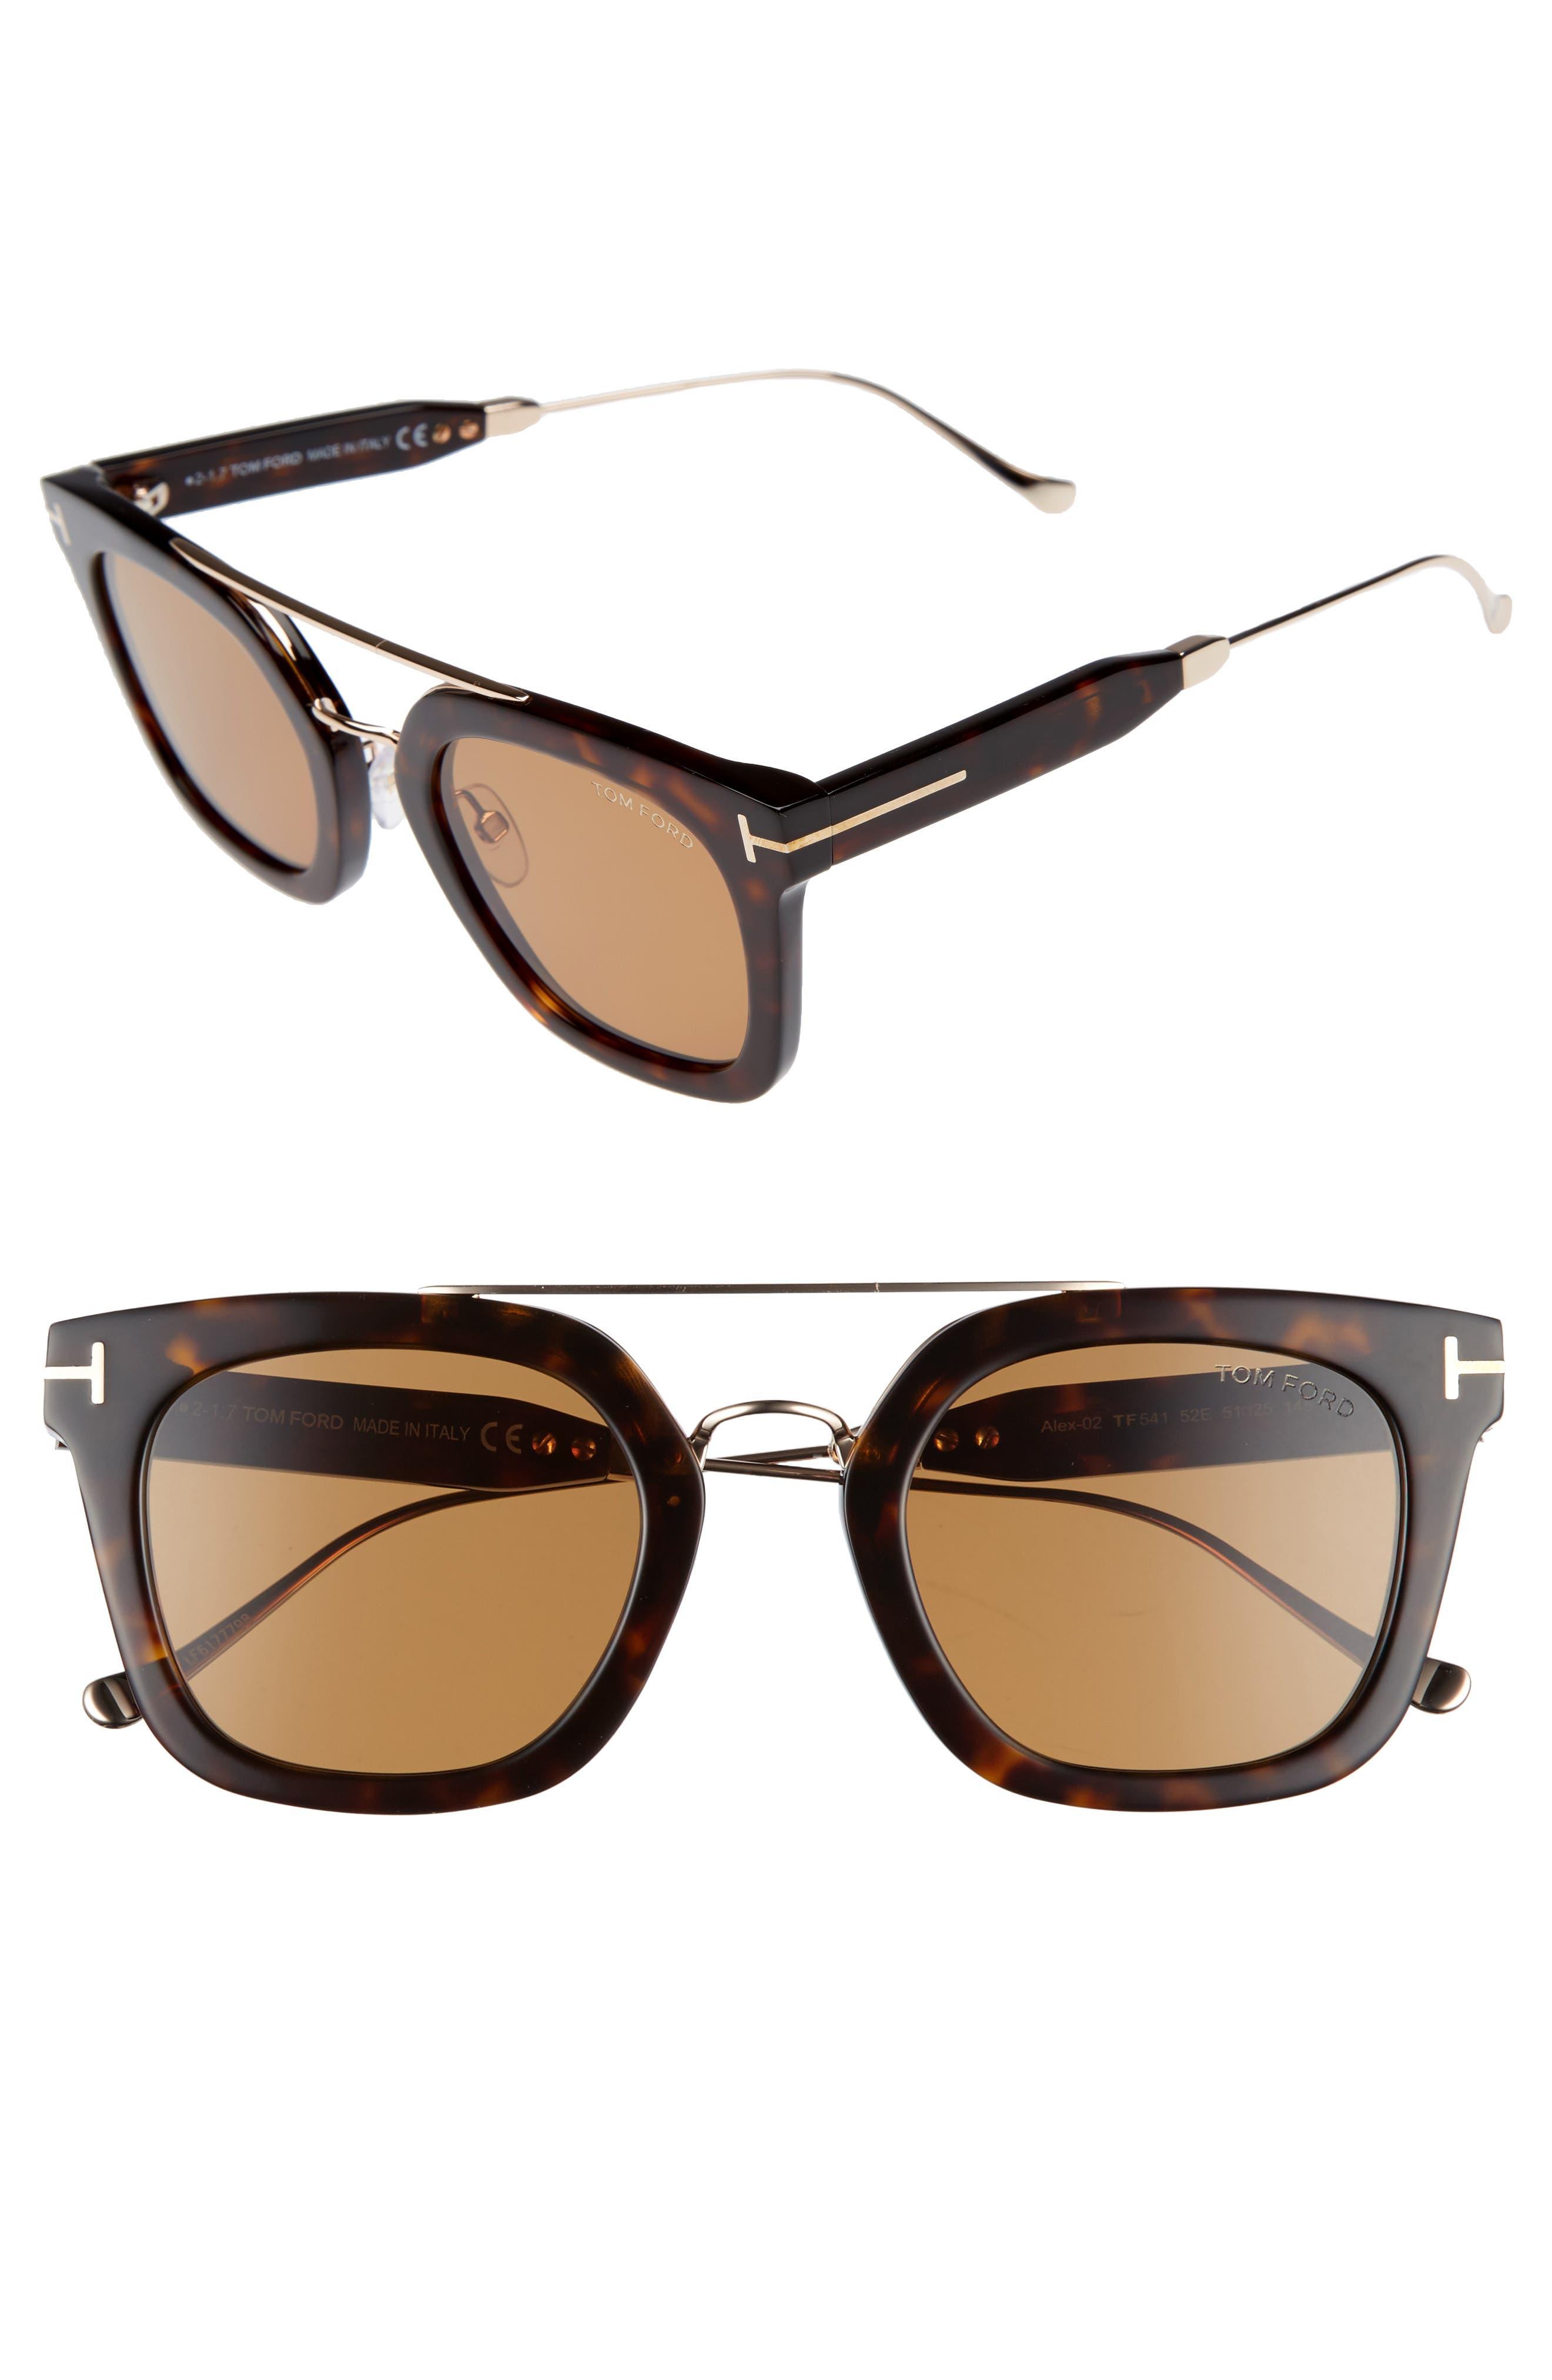 Alex 51mm Sunglasses,                         Main,                         color, Dark Havana / Brown